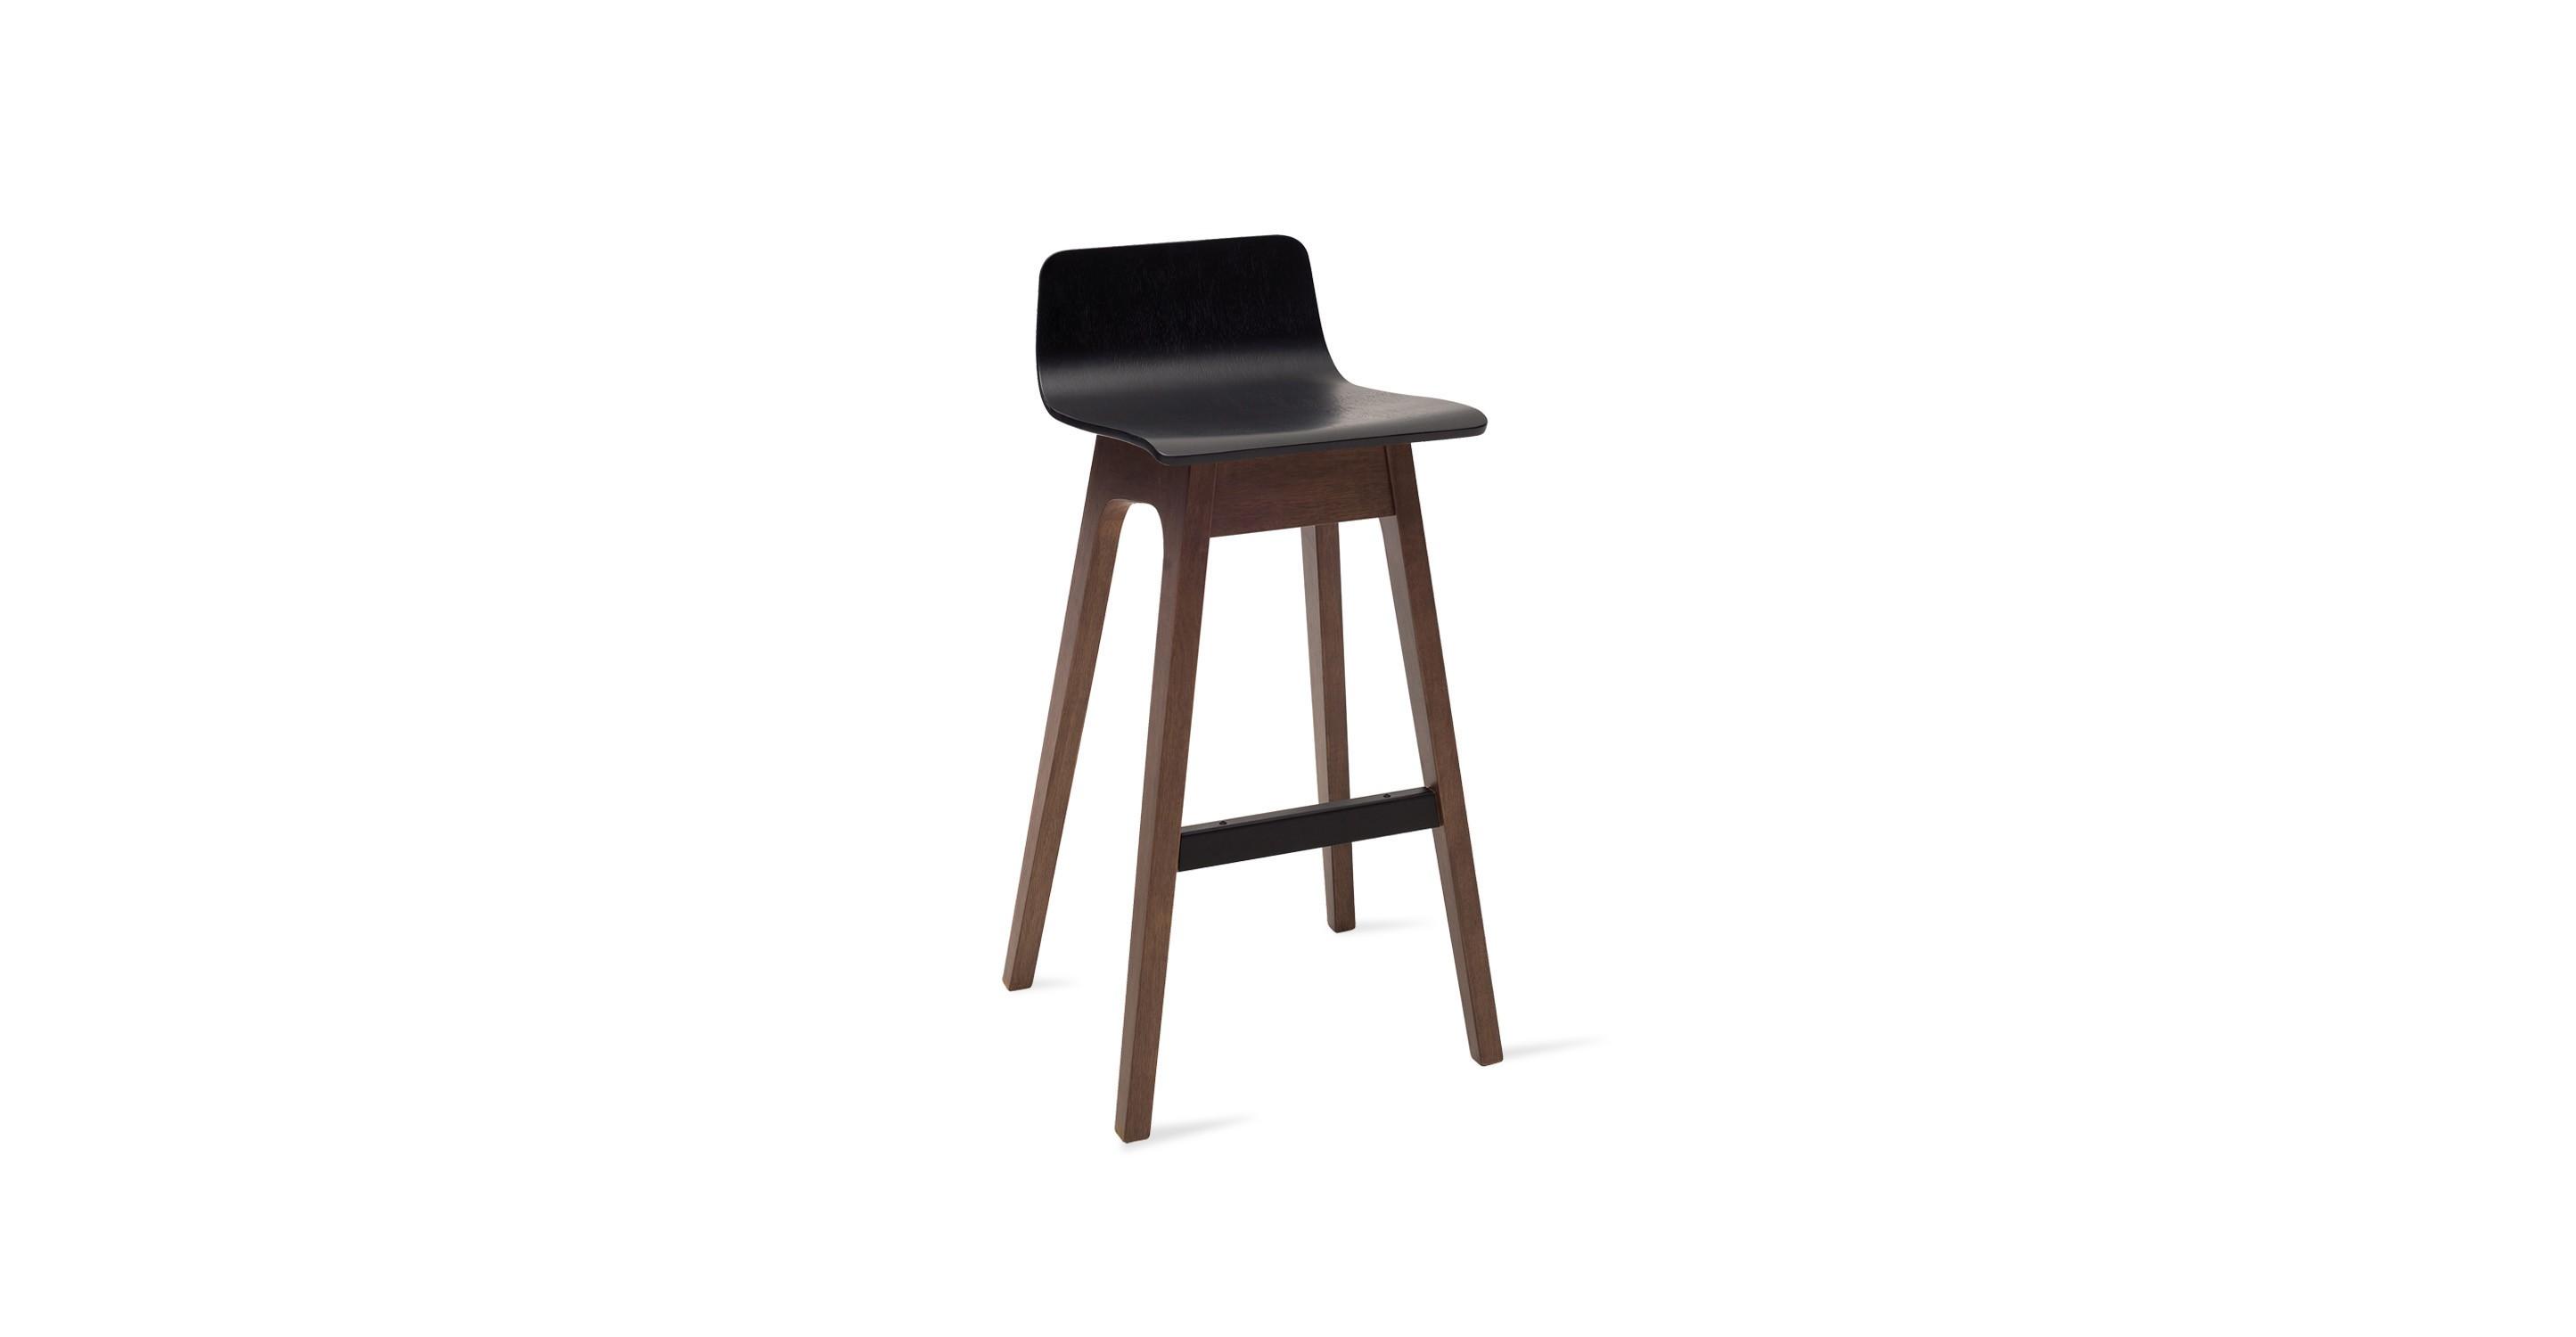 Ava black bar stool chairs stools article modern mid century and scandinavian furniture